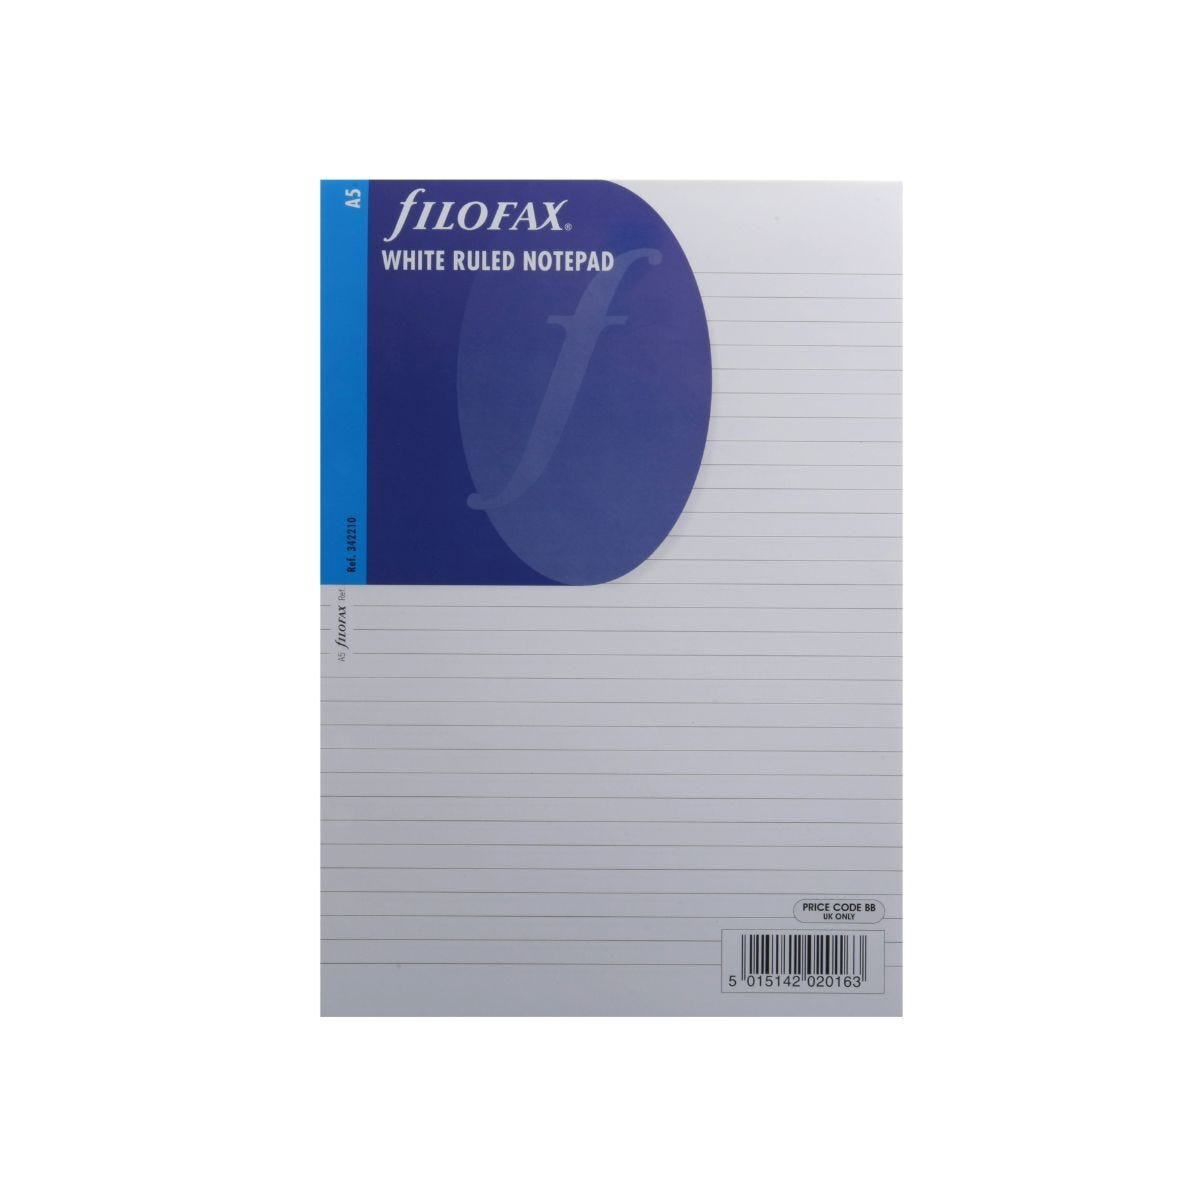 Filofax Refill A5 Notepad 50 Sheets